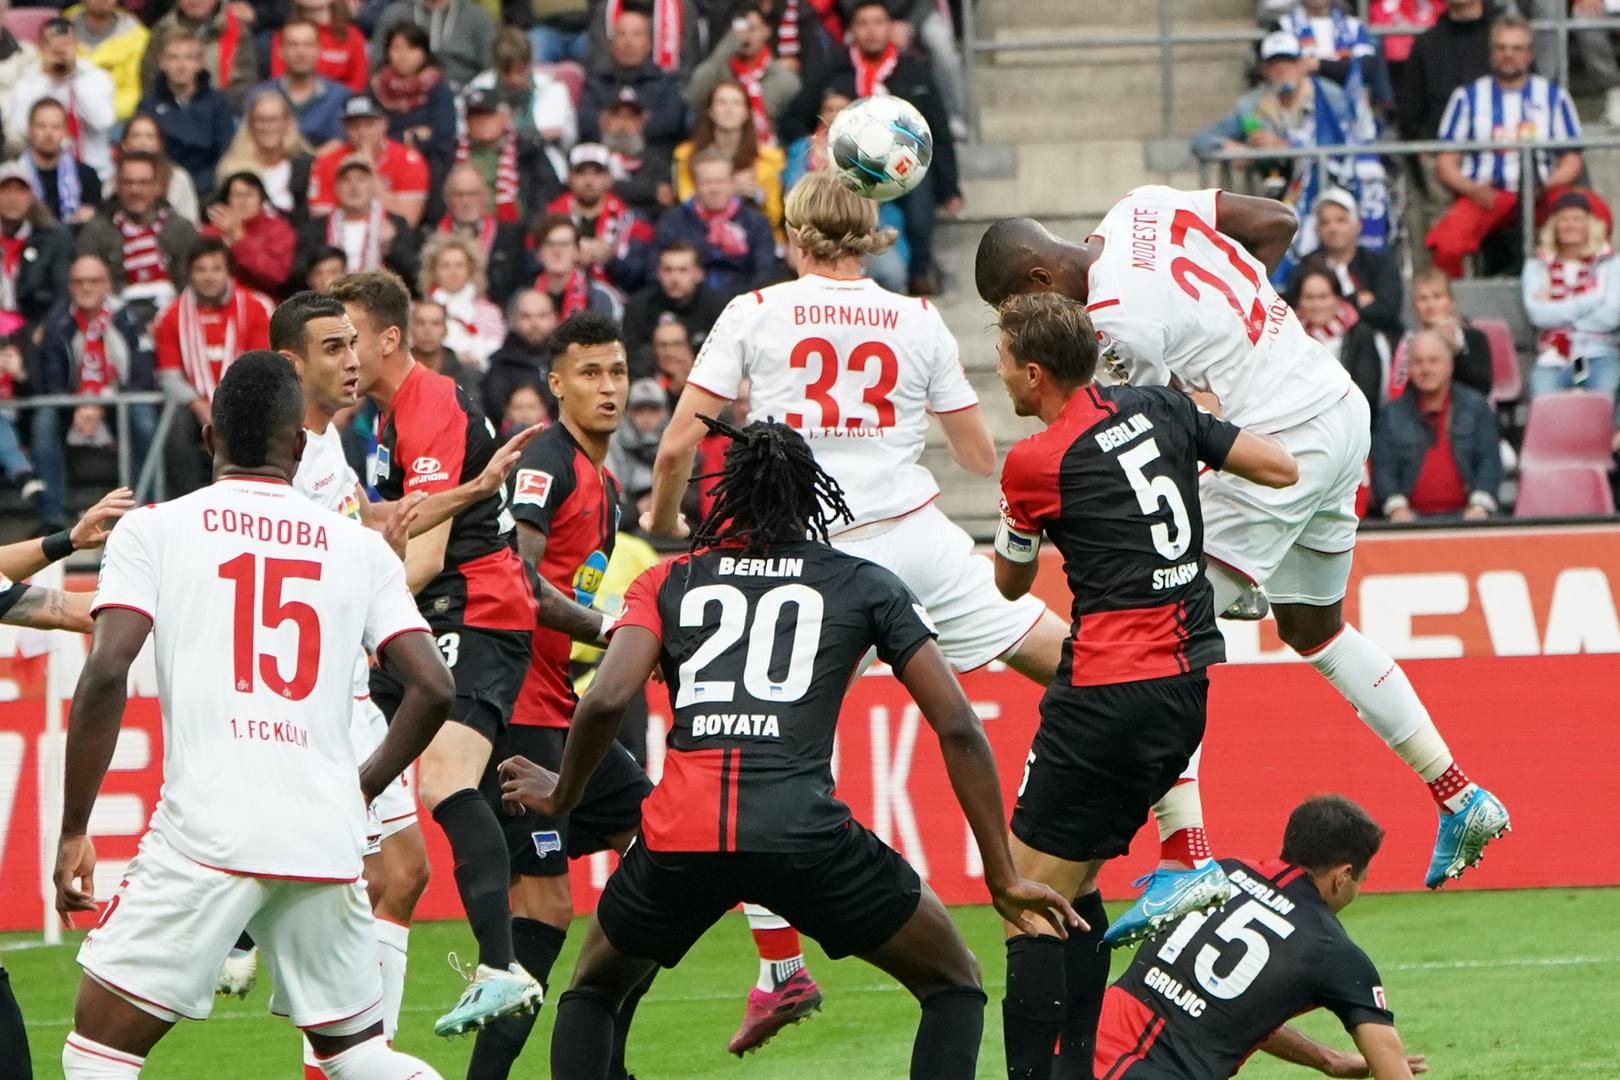 29 09 2019 Rheinenergiestadion Koln Ger 1 Fbl 1 Fc Koln Vs Hertha Bsc Berlin Foto Bild Sport Ballsport Fussball Bilder Auf Fotocommunity